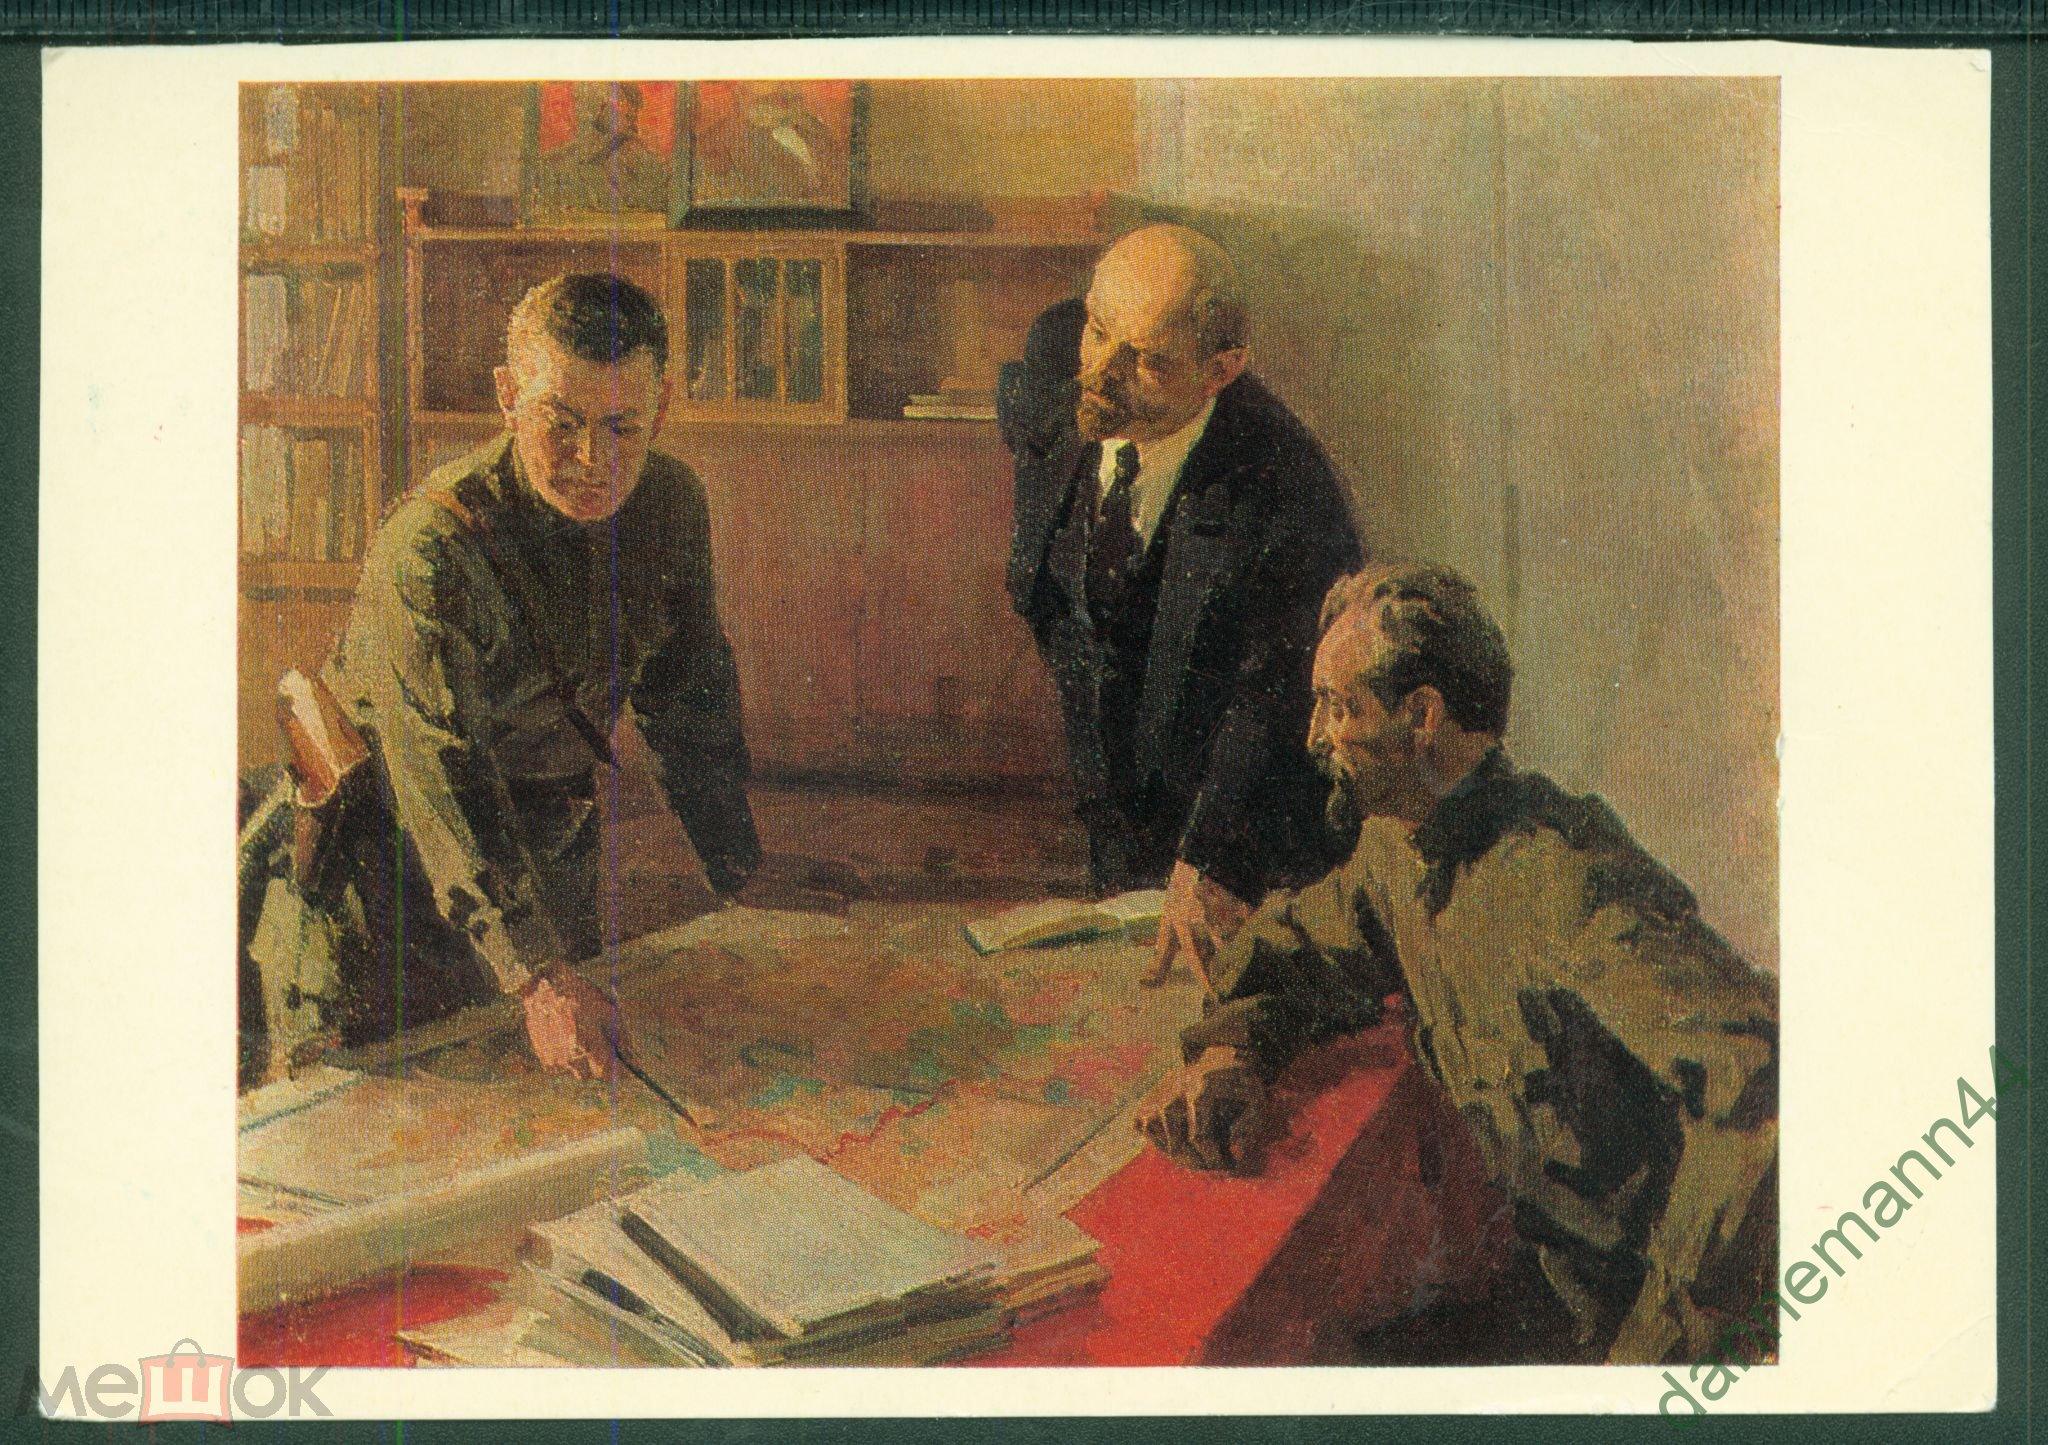 Ленин и дзержинский слушают доклад федотова 156